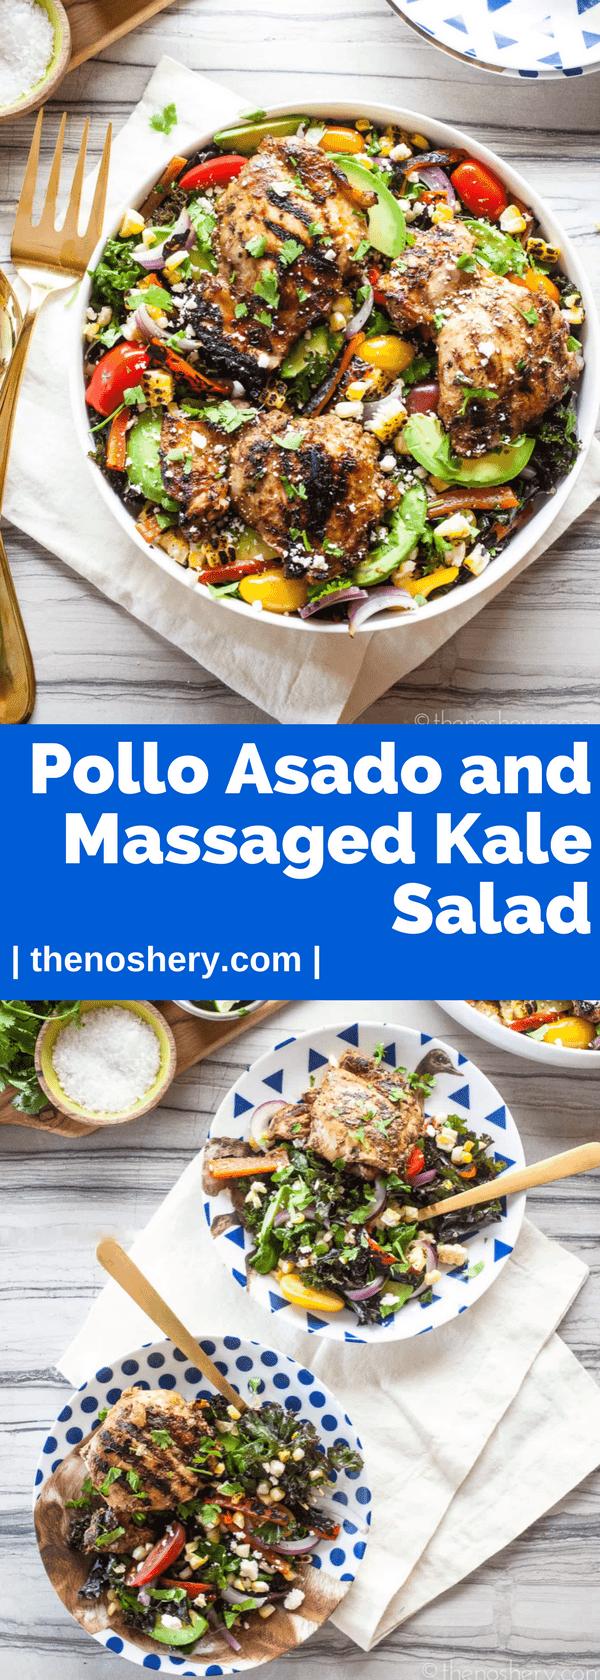 Pollo Asado and Massaged Kale Salad